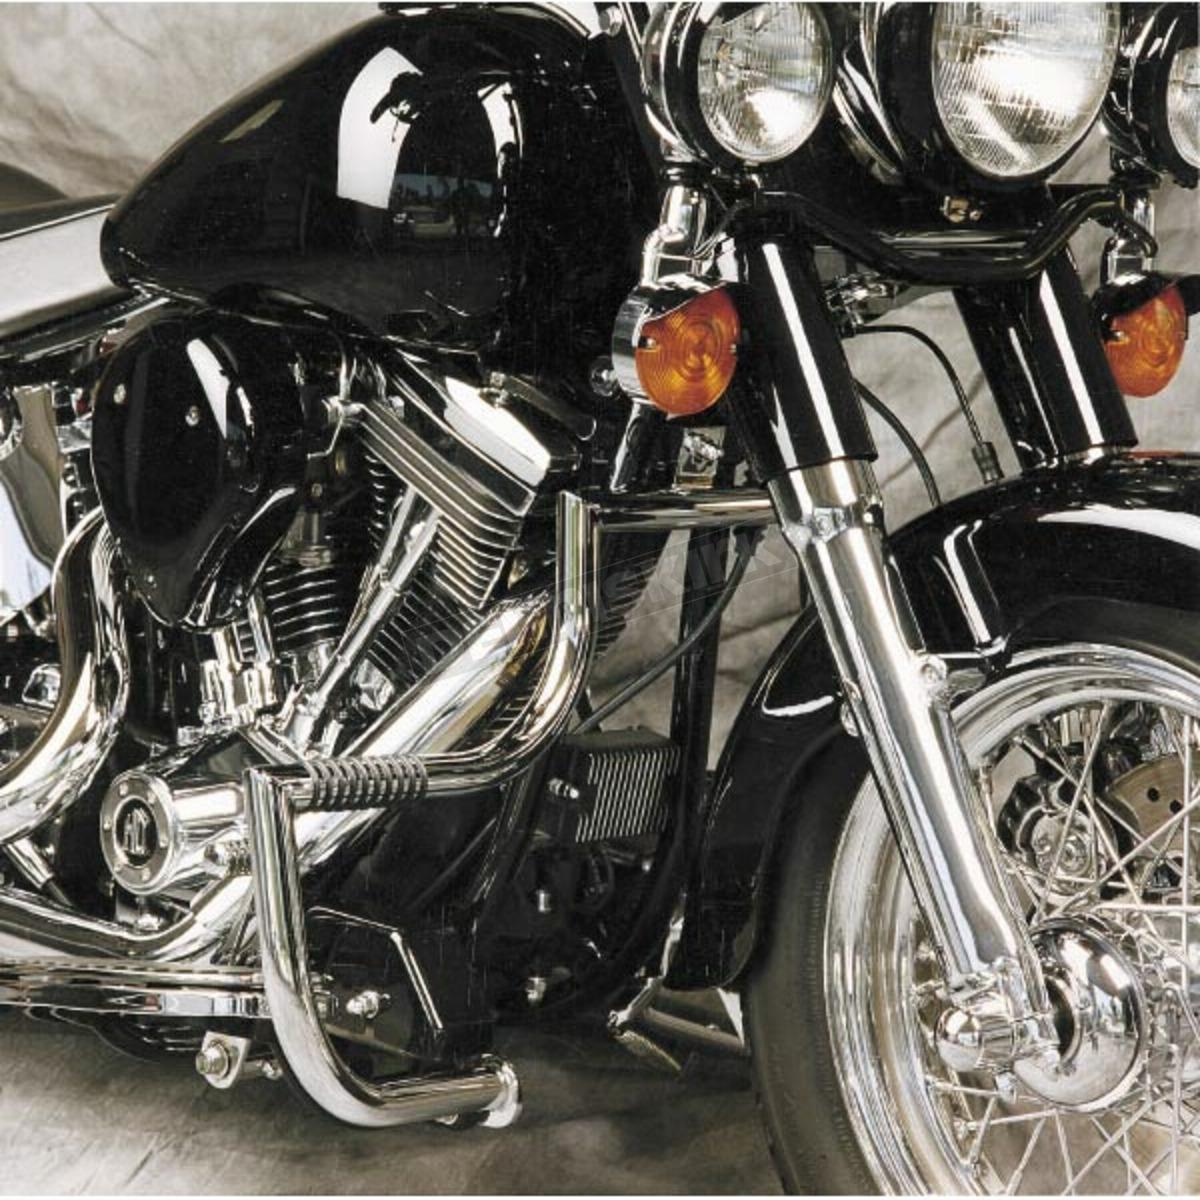 Lindby Linbar Crash Bars 1991-2018 Harley Davidson Dyna Models (With Mid  Controls) - Chrome